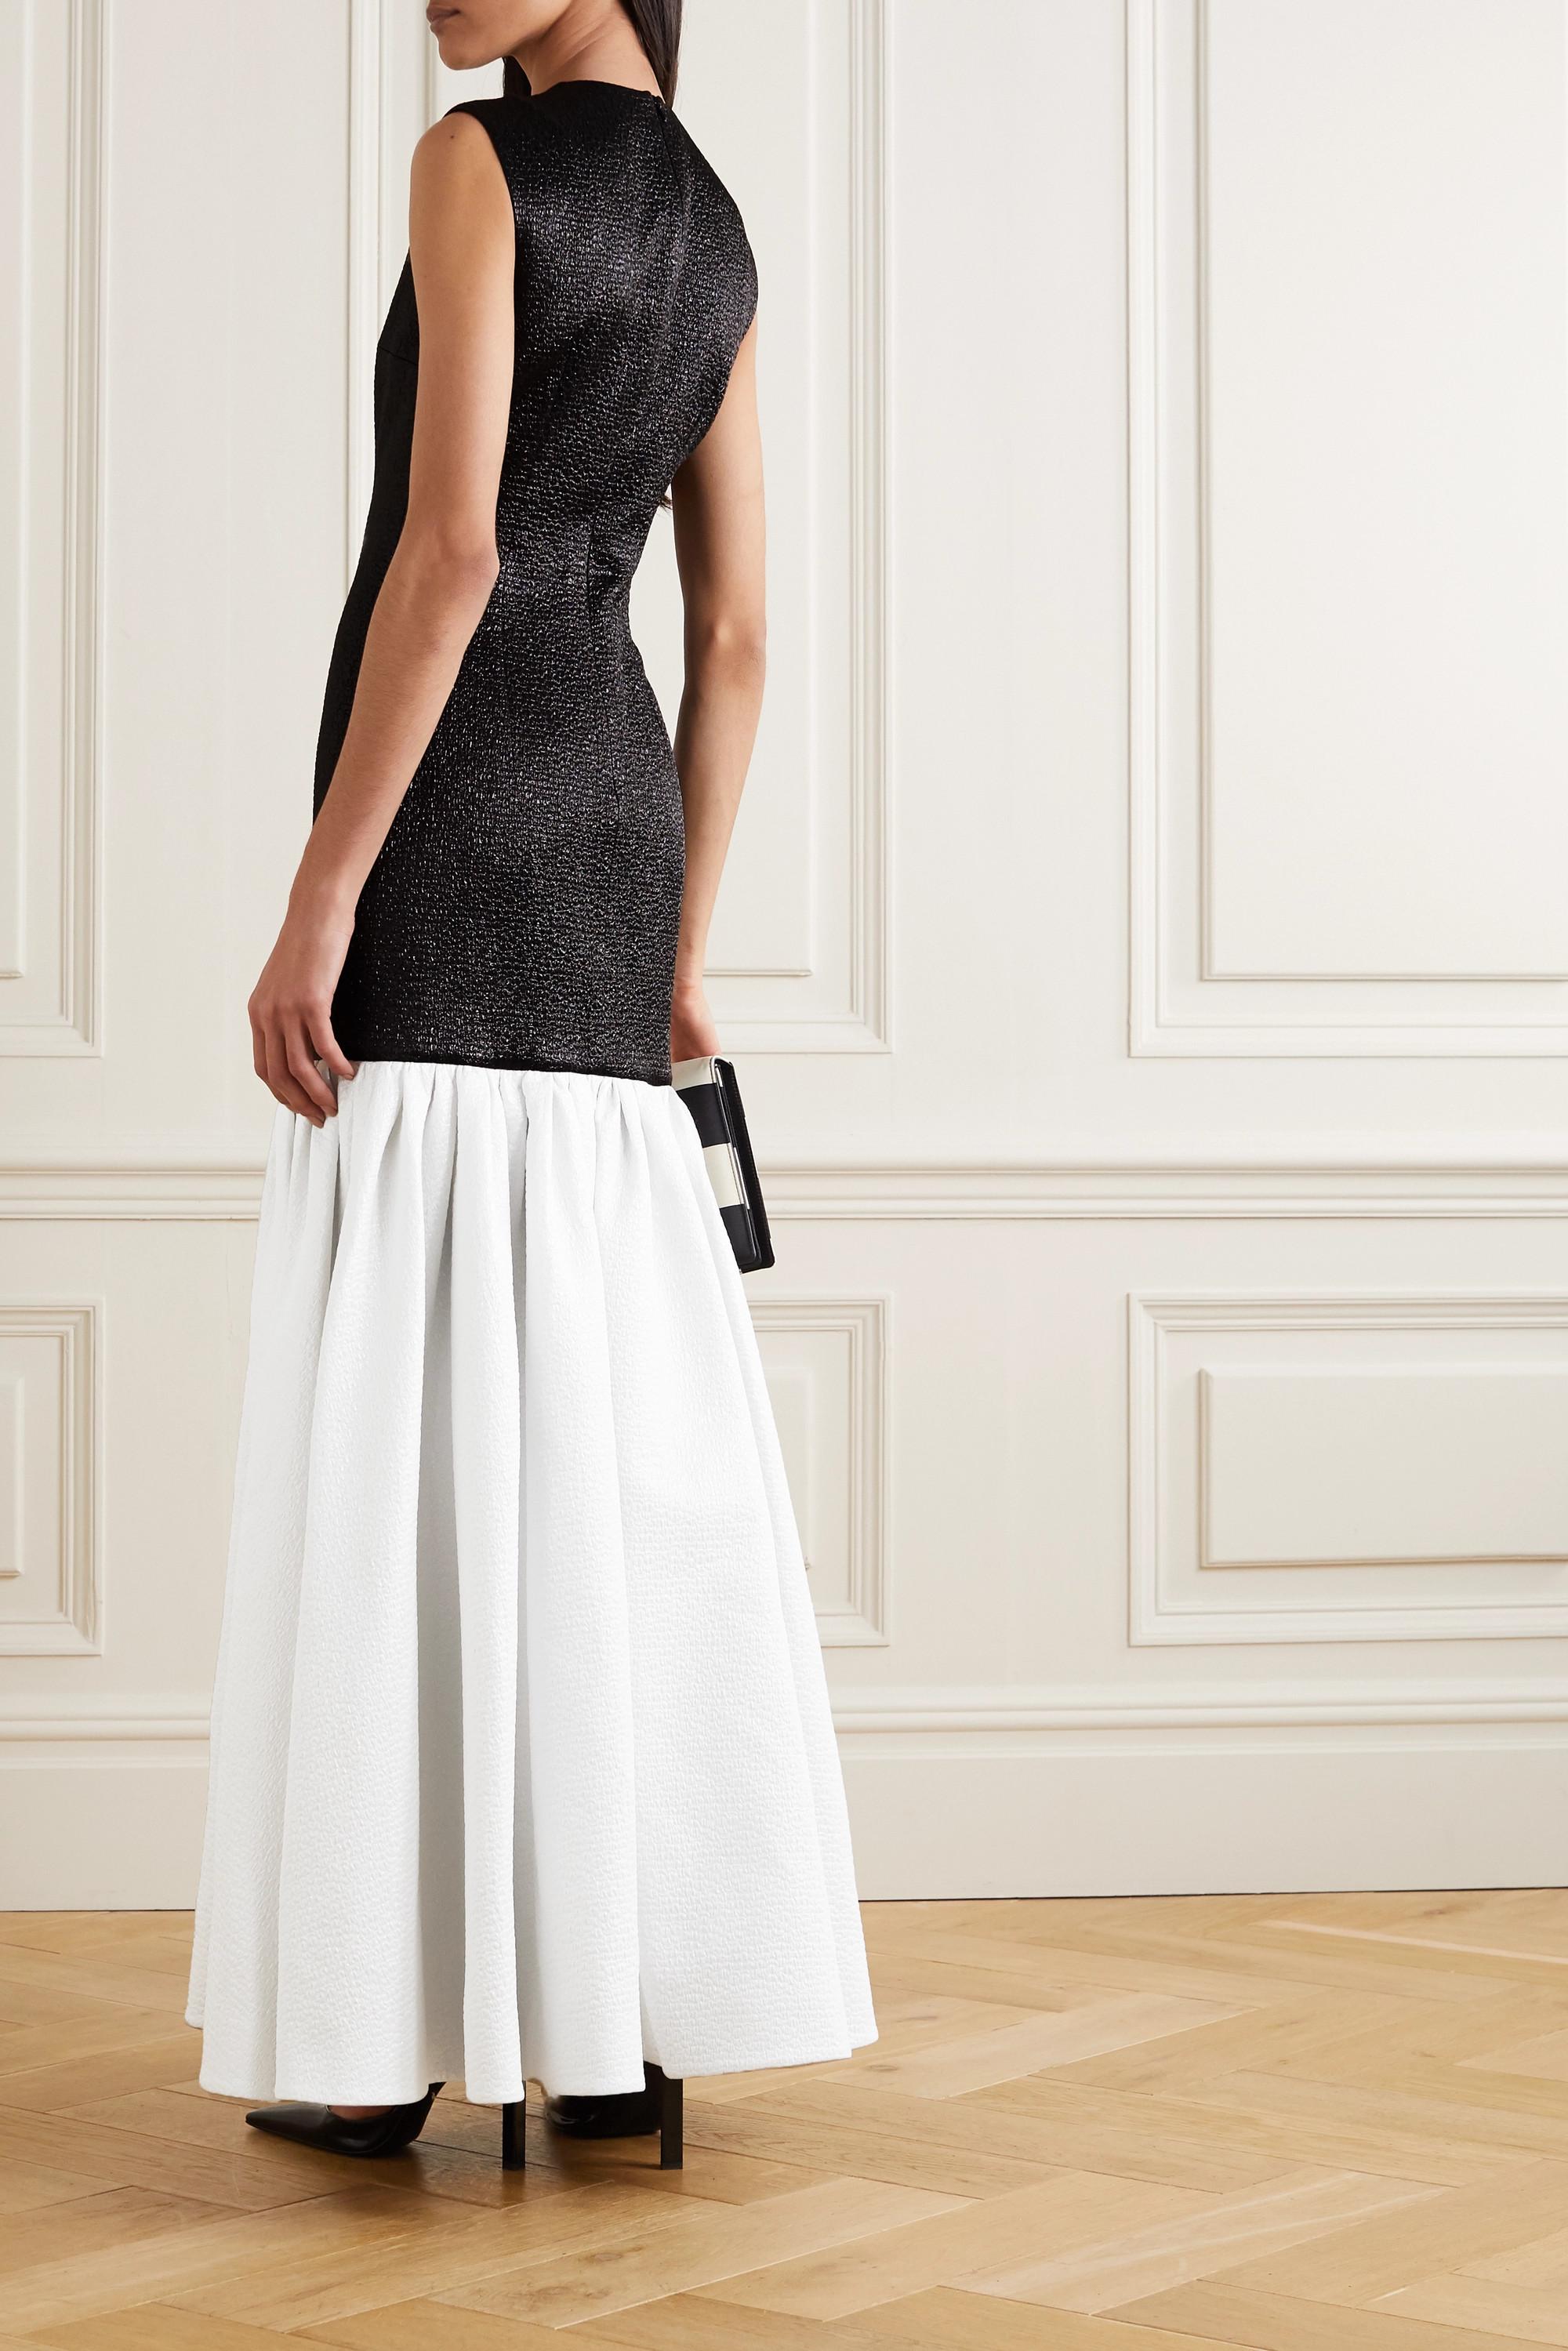 Emilia Wickstead Kay ruffled two-tone cloqué gown